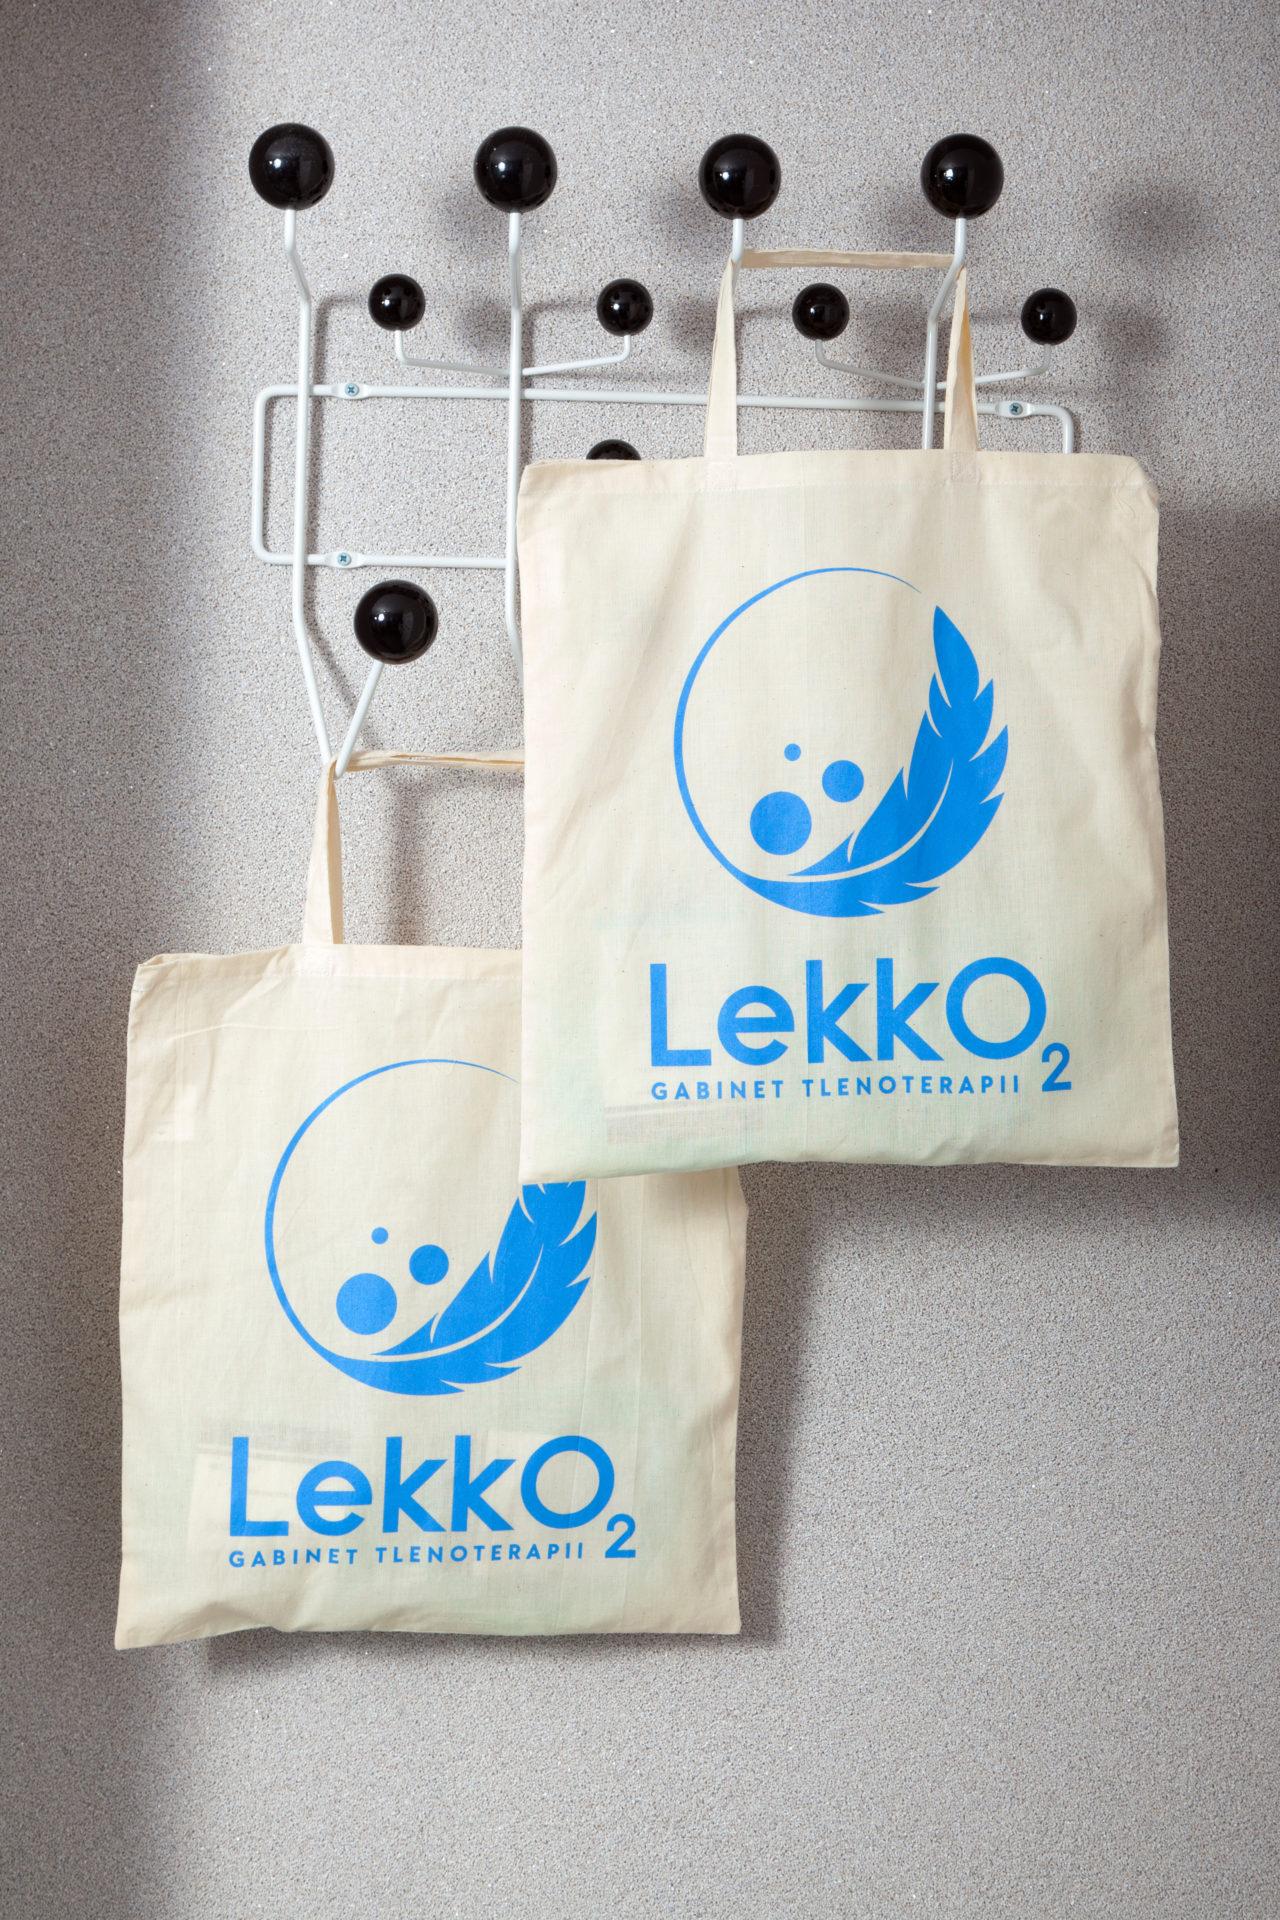 LekkO2 - Gabinet tlenoterapii - Torby